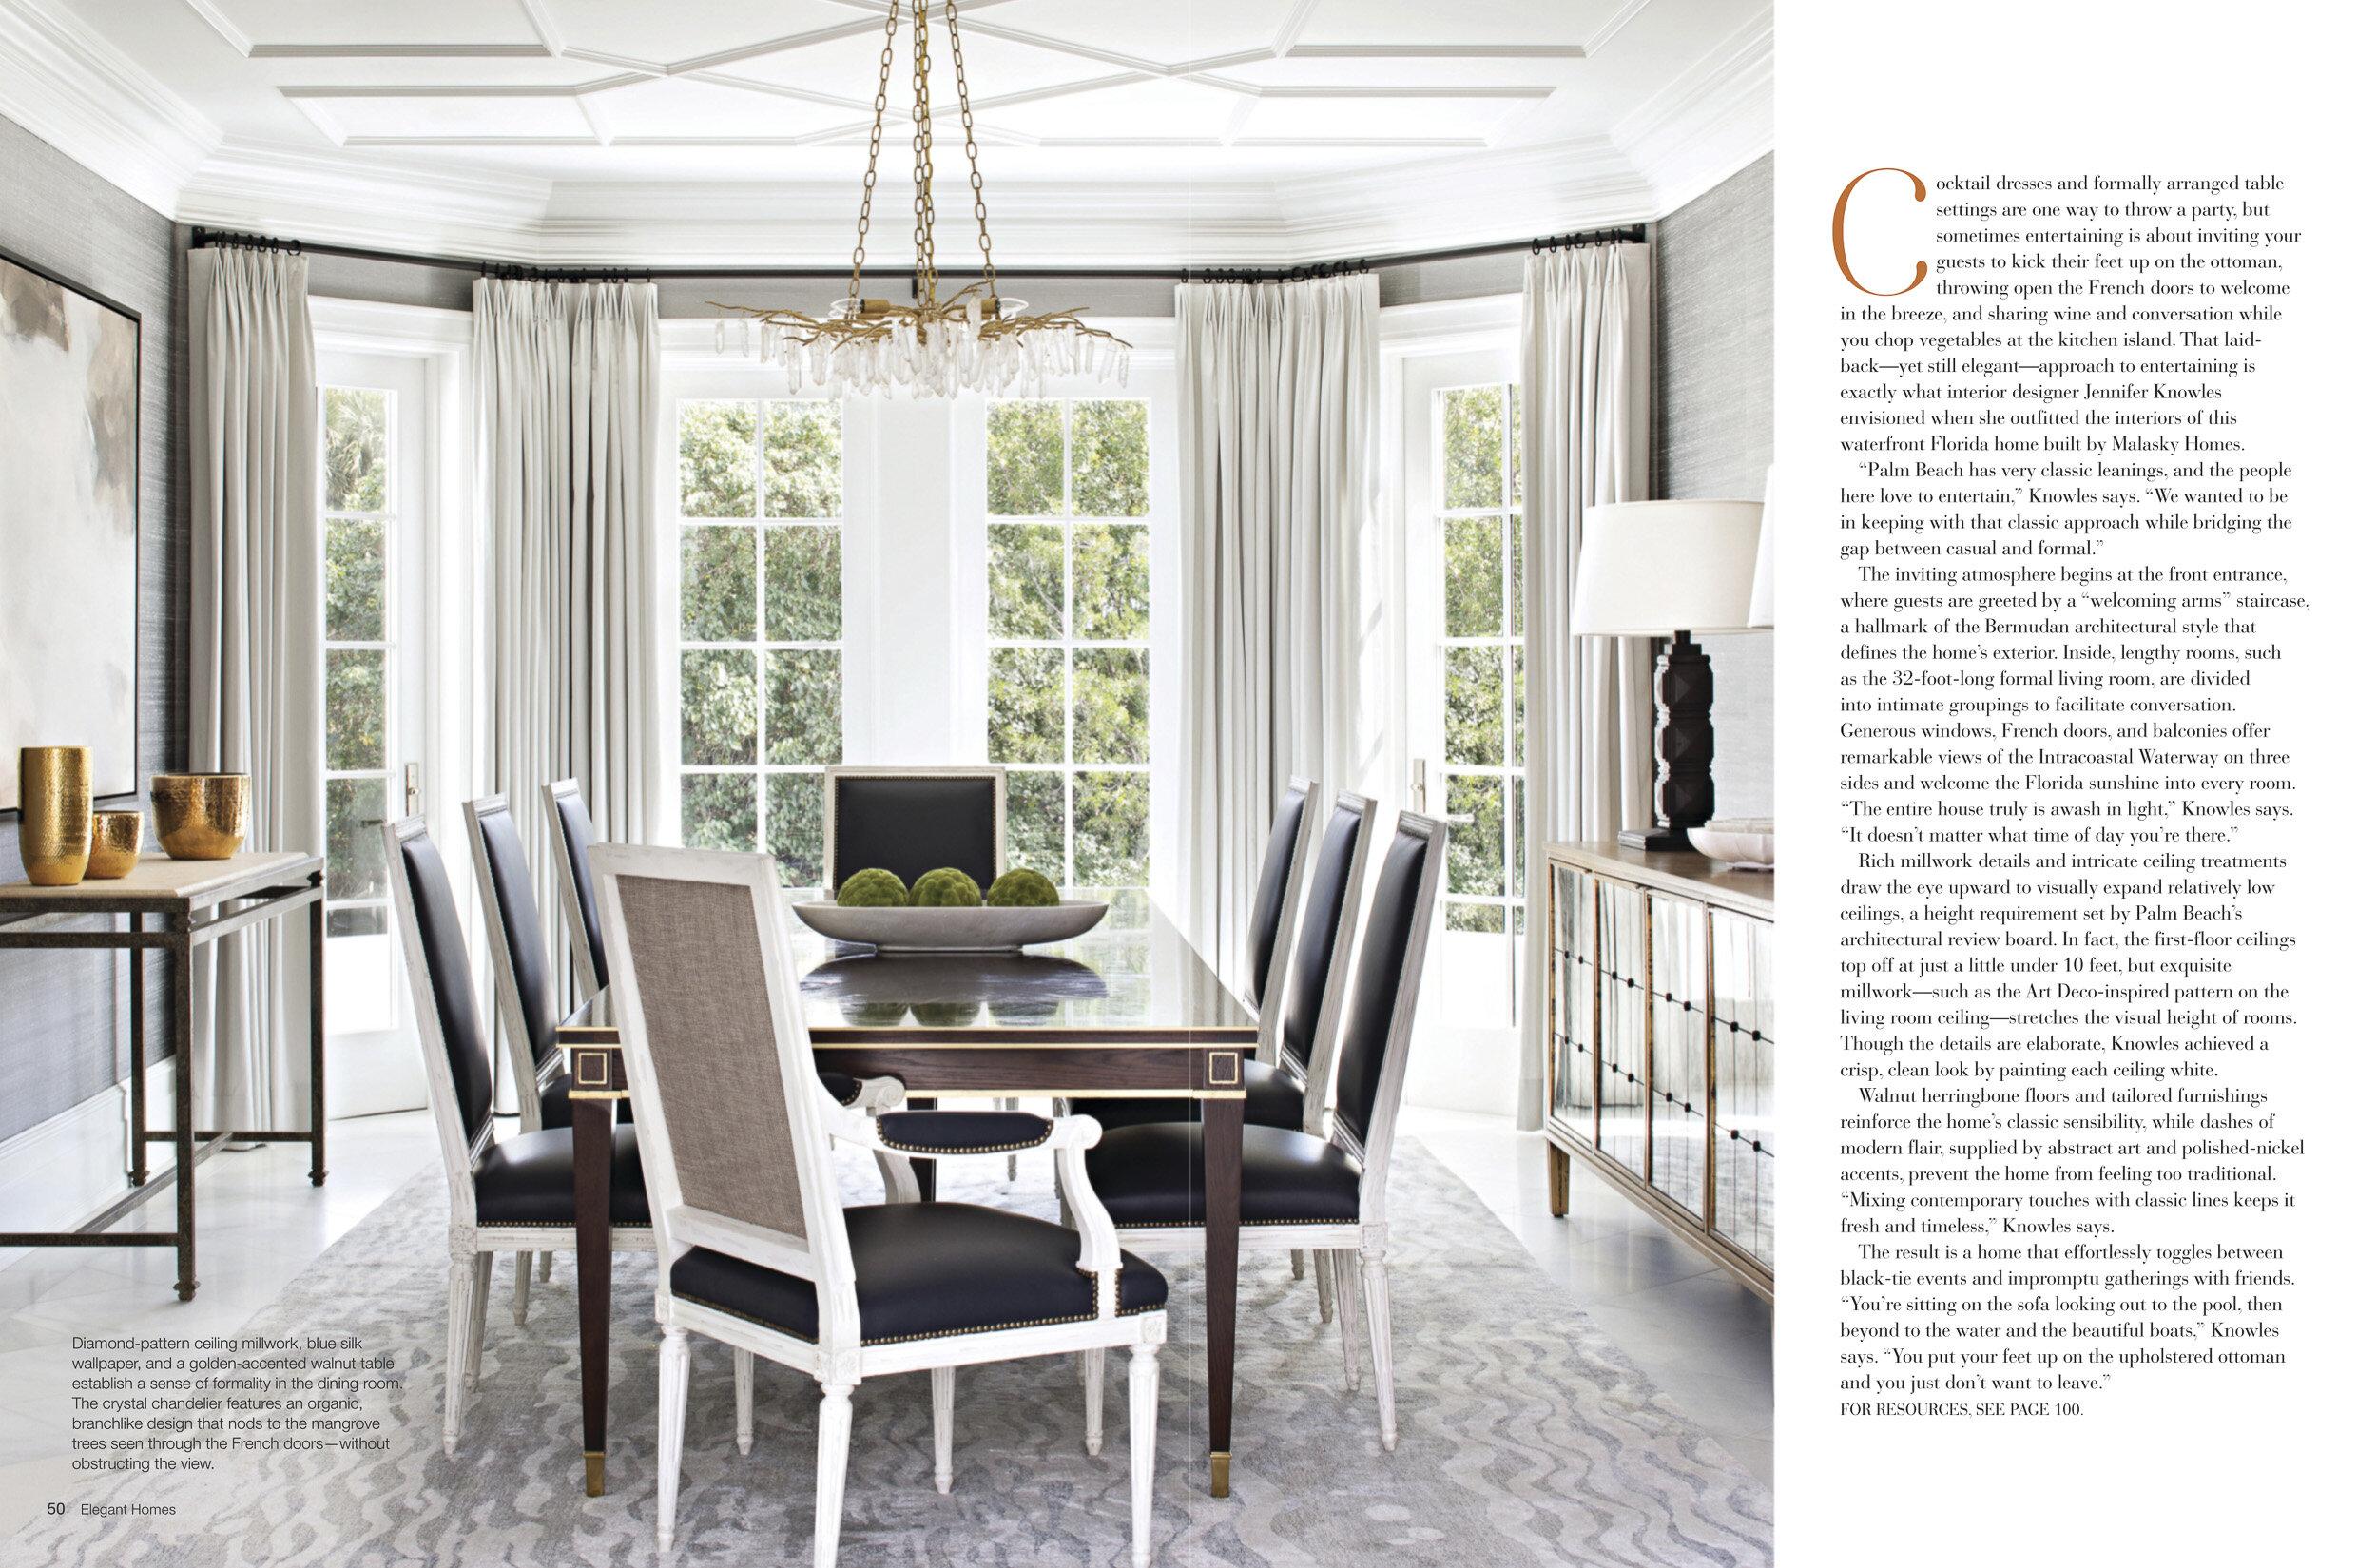 knowles-design-media-elegant-homes-fall-2019-feature-spread-02.jpg